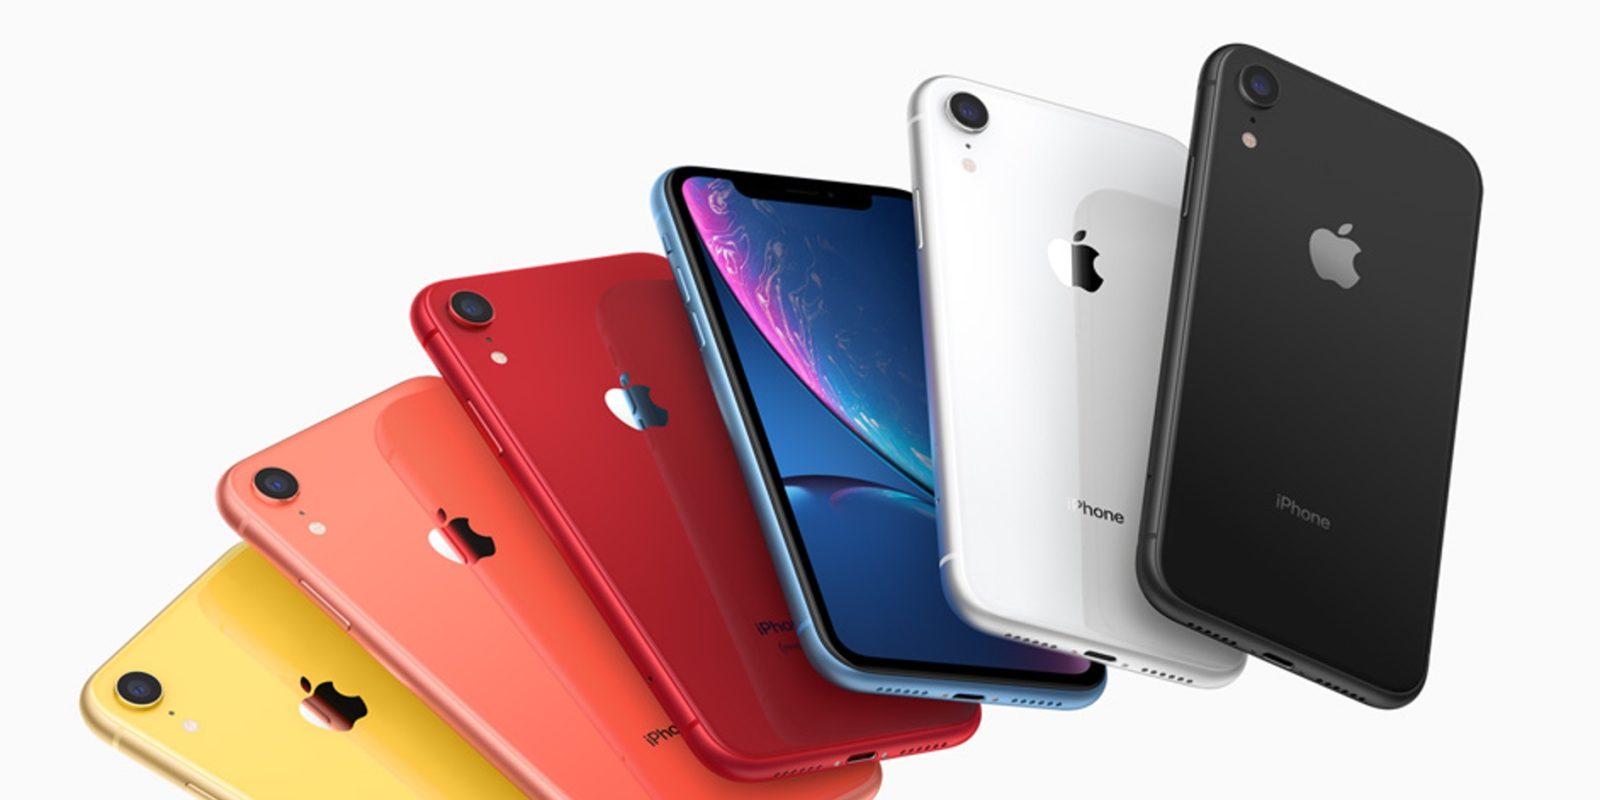 iPhone 11, iPhone XR и iPhone 8_какой из iphone выбрать - iPhone XR в разных цветах